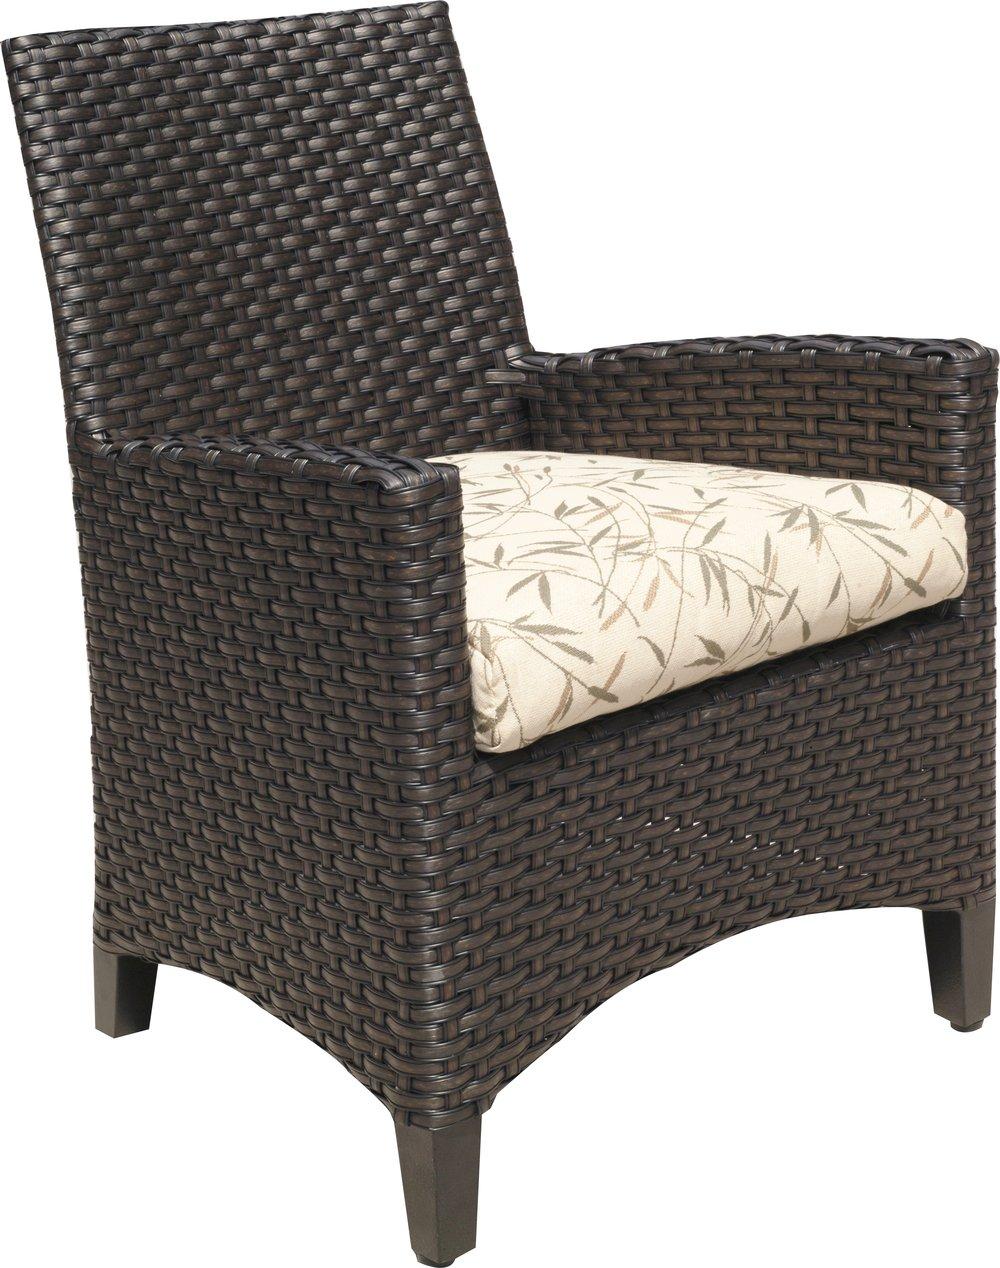 "971521   Kapaa Dining Arm Chair   25.8"" x 27.4"" x 36.5"""